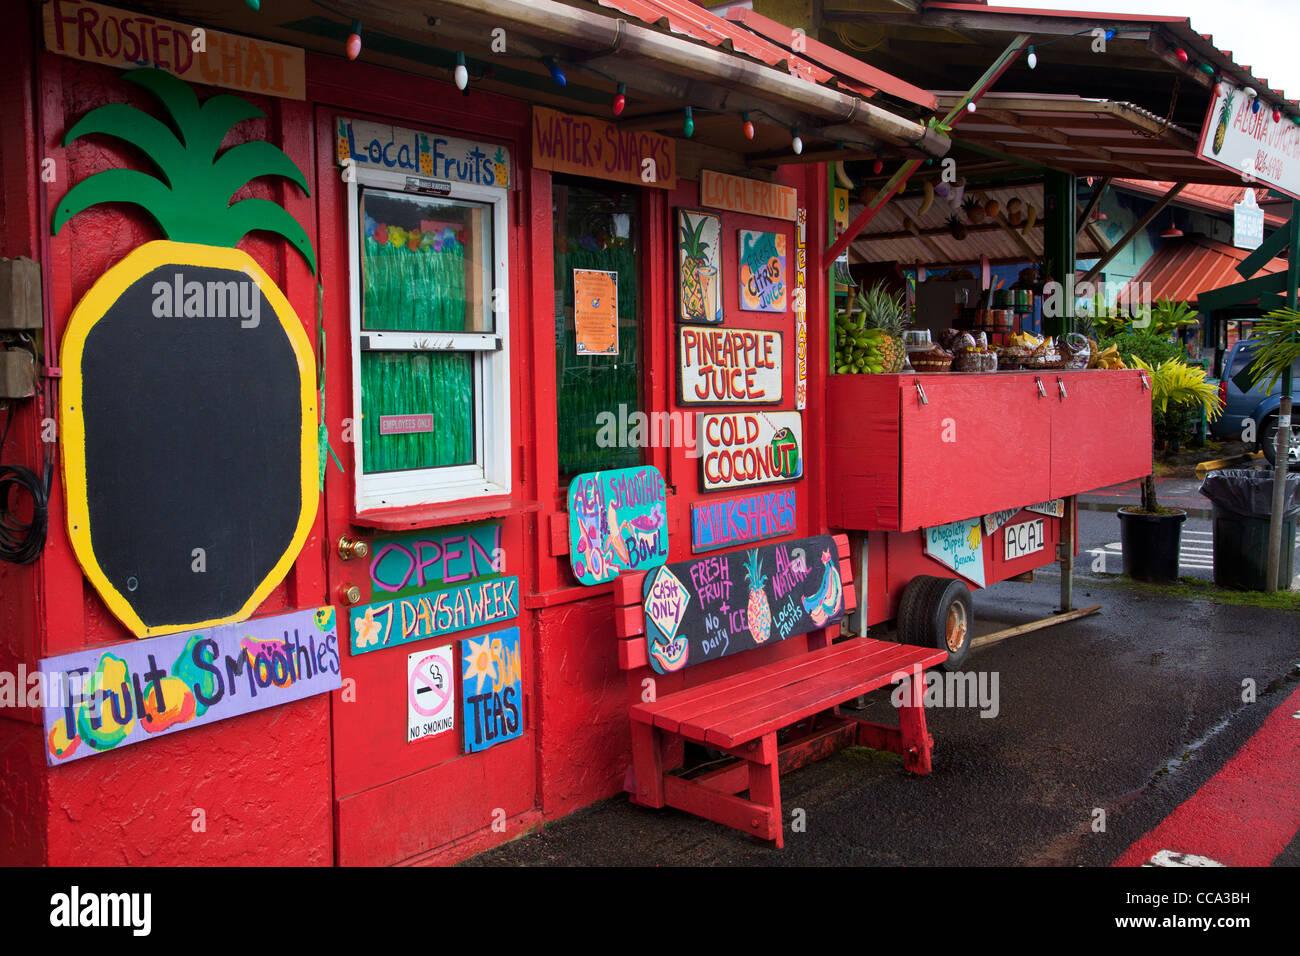 Fruit stand, Hanalei, Kauai, Hawaii. Stock Photo